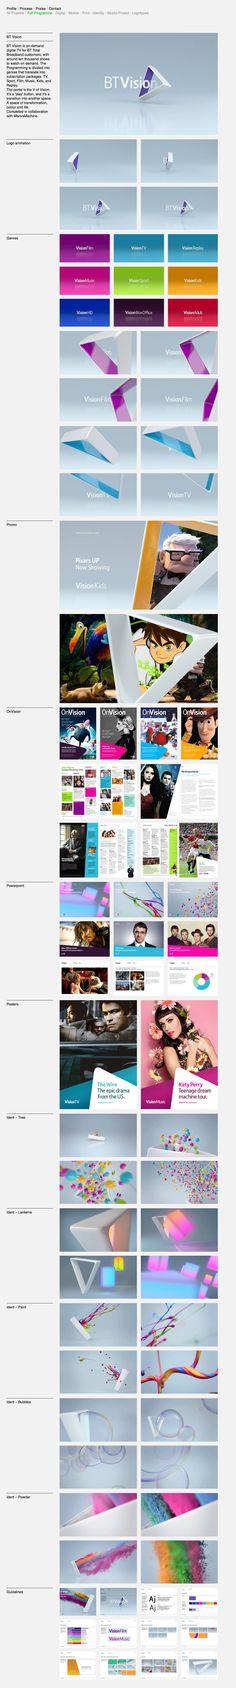 Corporate Presentation / Color / Framing / Photography Integration /// BT Vision branding by Proud Creative Identity Design, Brochure Design, Brand Identity, Kids Branding, Logo Branding, Branding Ideas, Corporate Presentation, Corporate Design, Corporate Identity